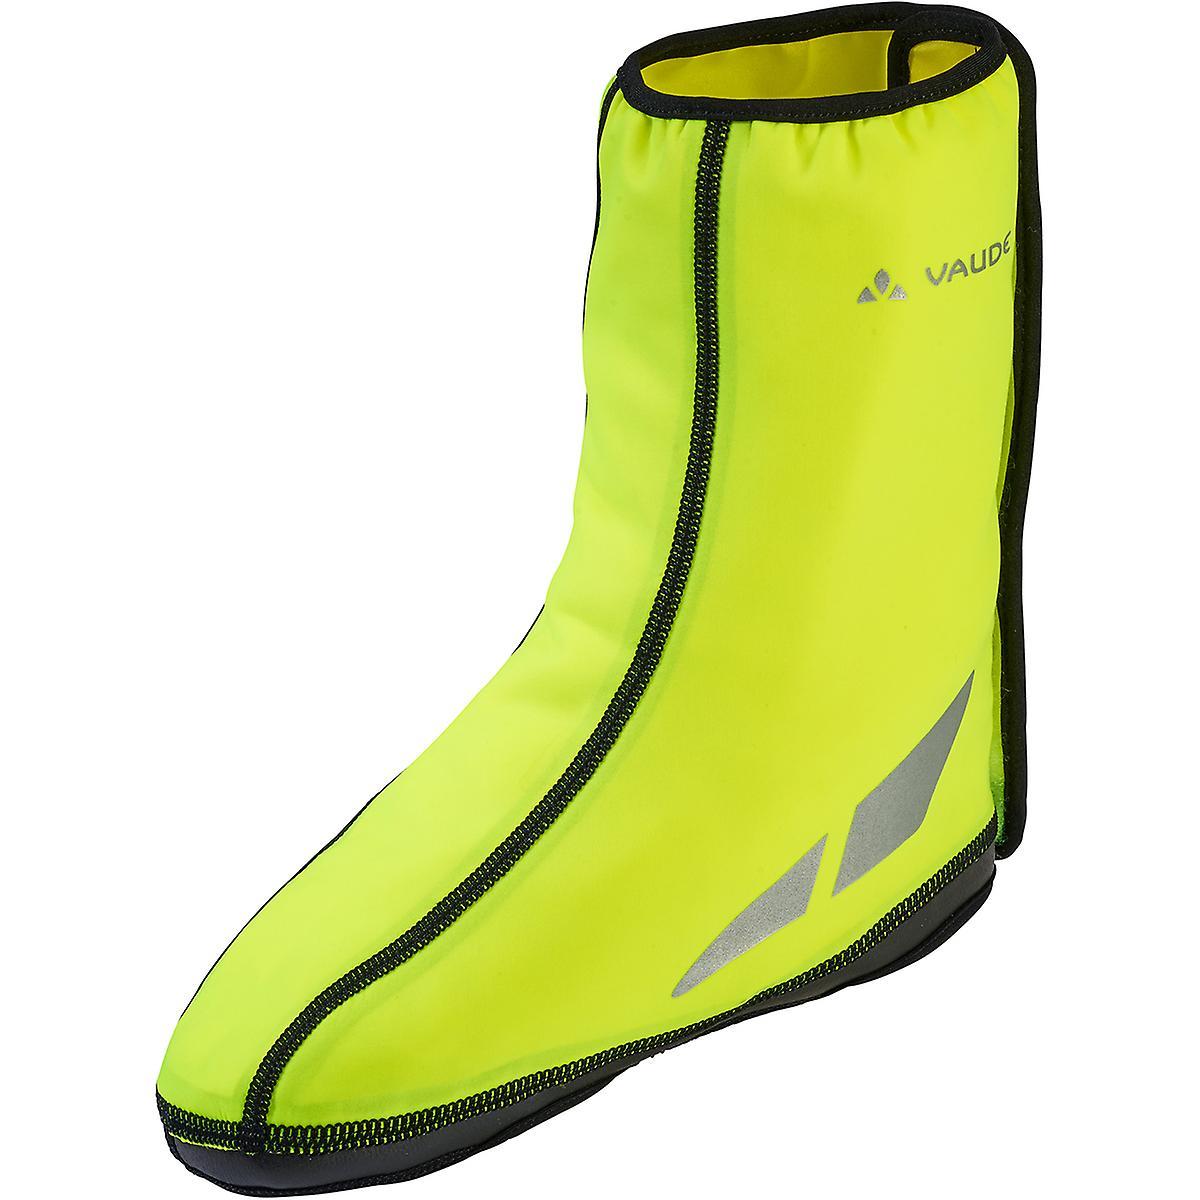 Vaude Wet Light III Cycling chaussures Covers - Neon jaune